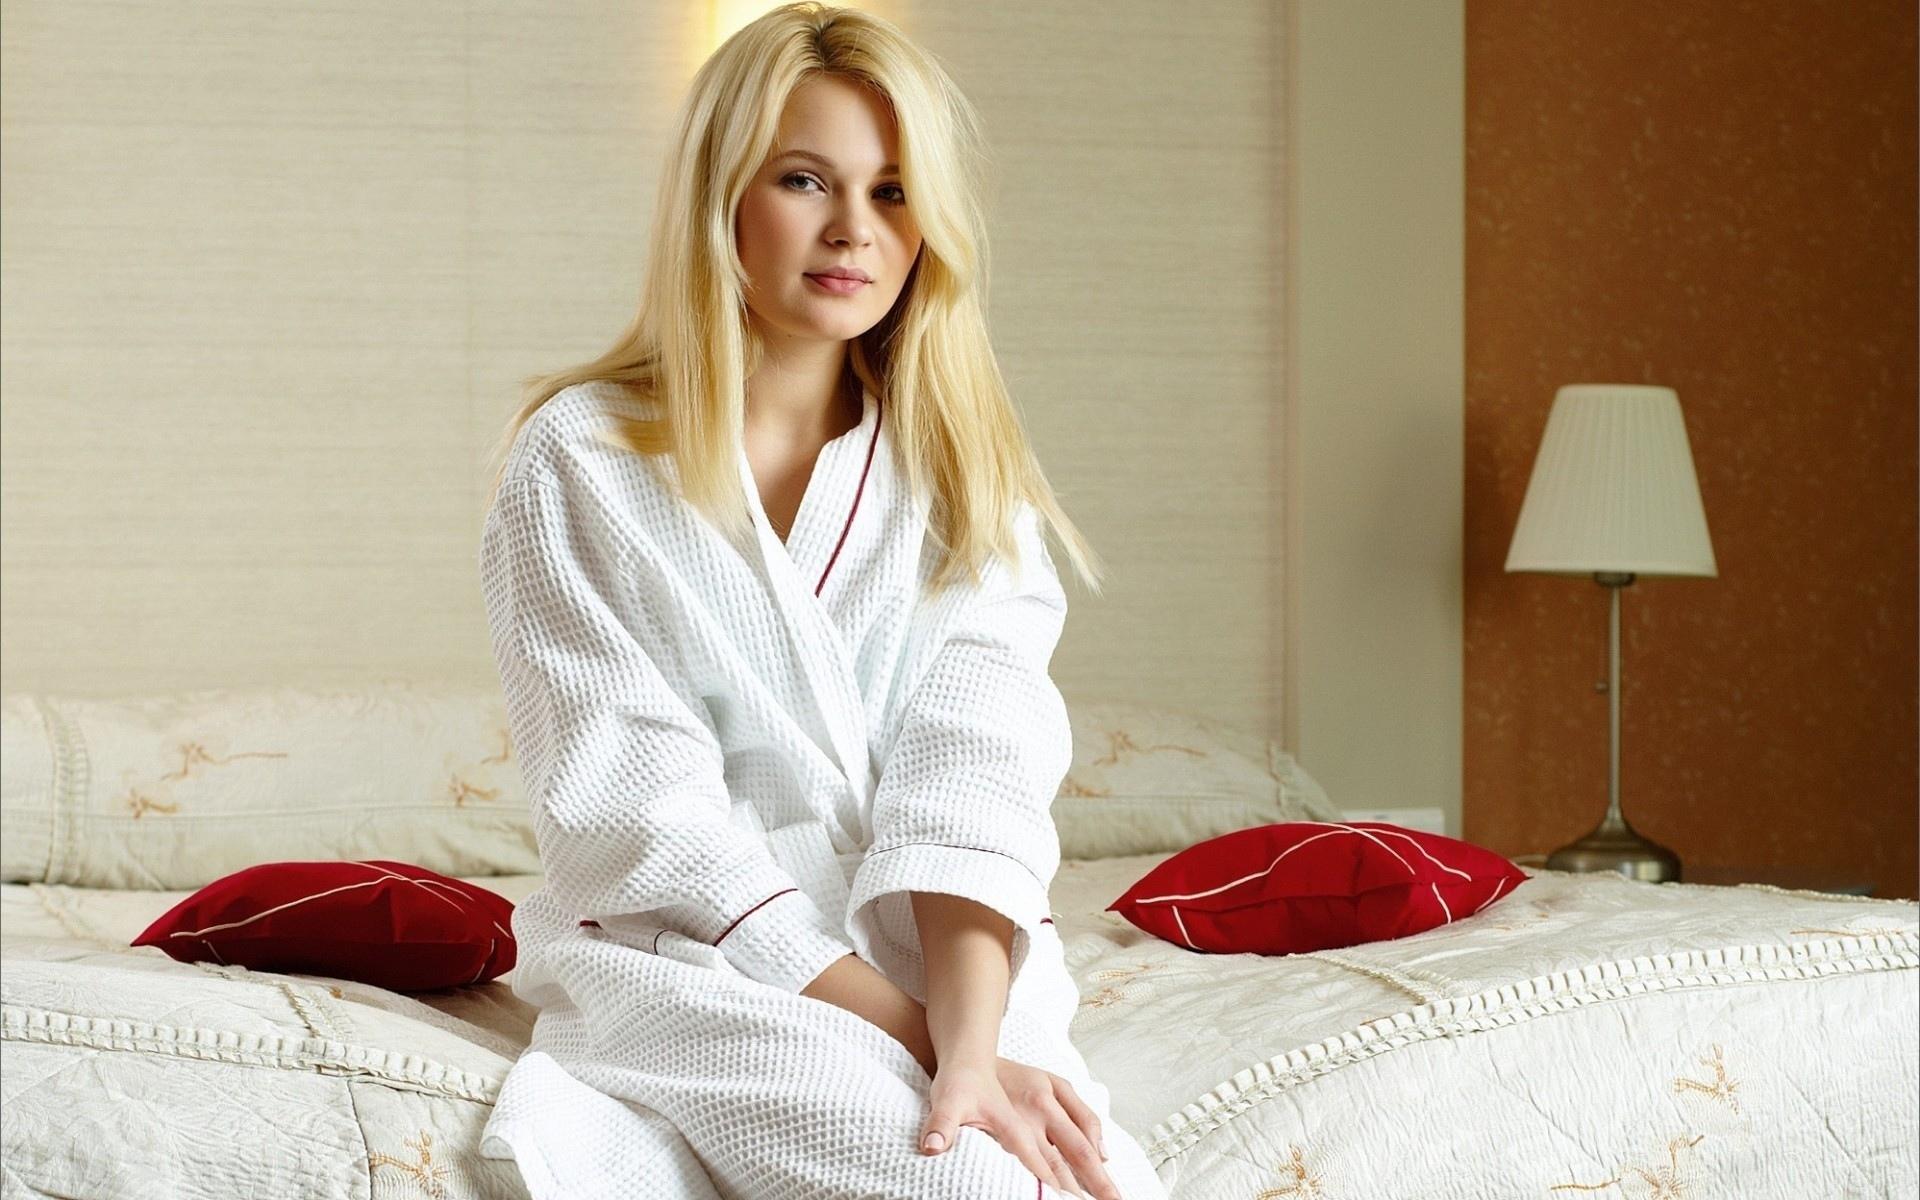 Фото блондинок б белых халатиках 2 фотография